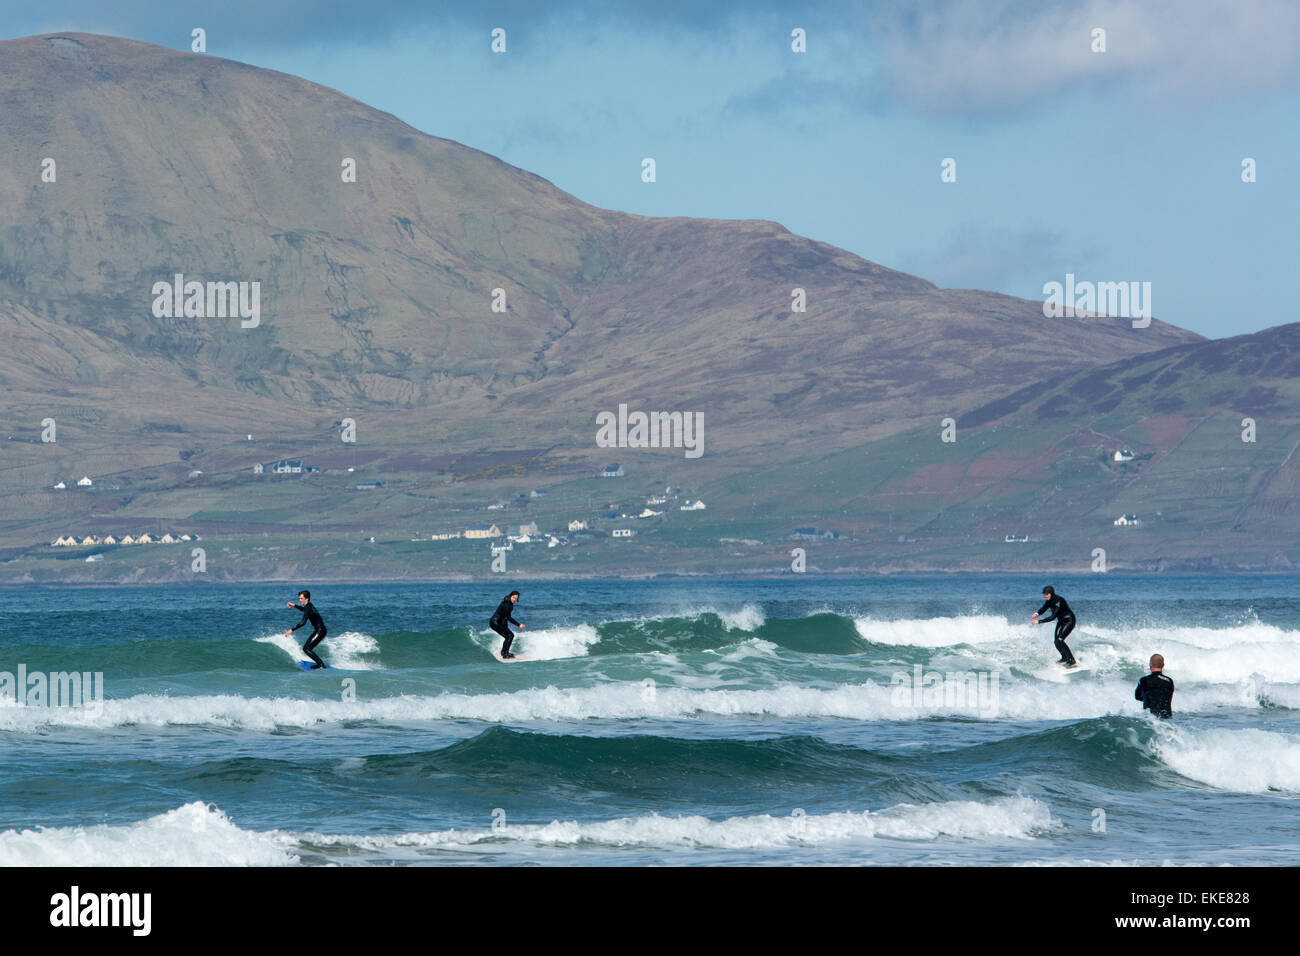 Surfing along the Wild Atlantic Way on the West Coast of Ireland - Stock Image